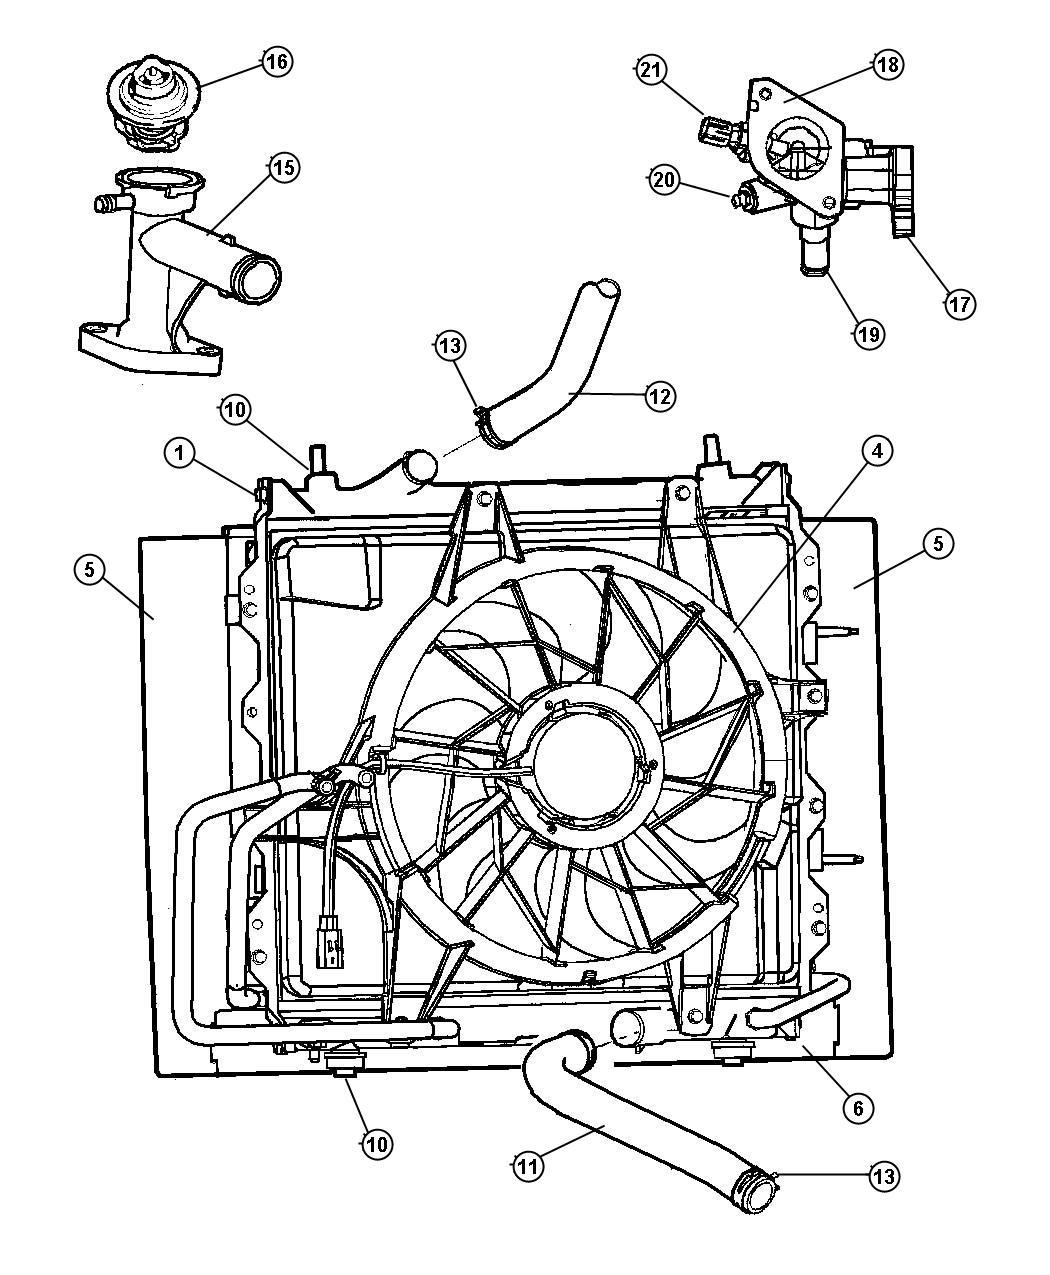 Electrical Wiring Diagrams 00 Astro Auto Diagram